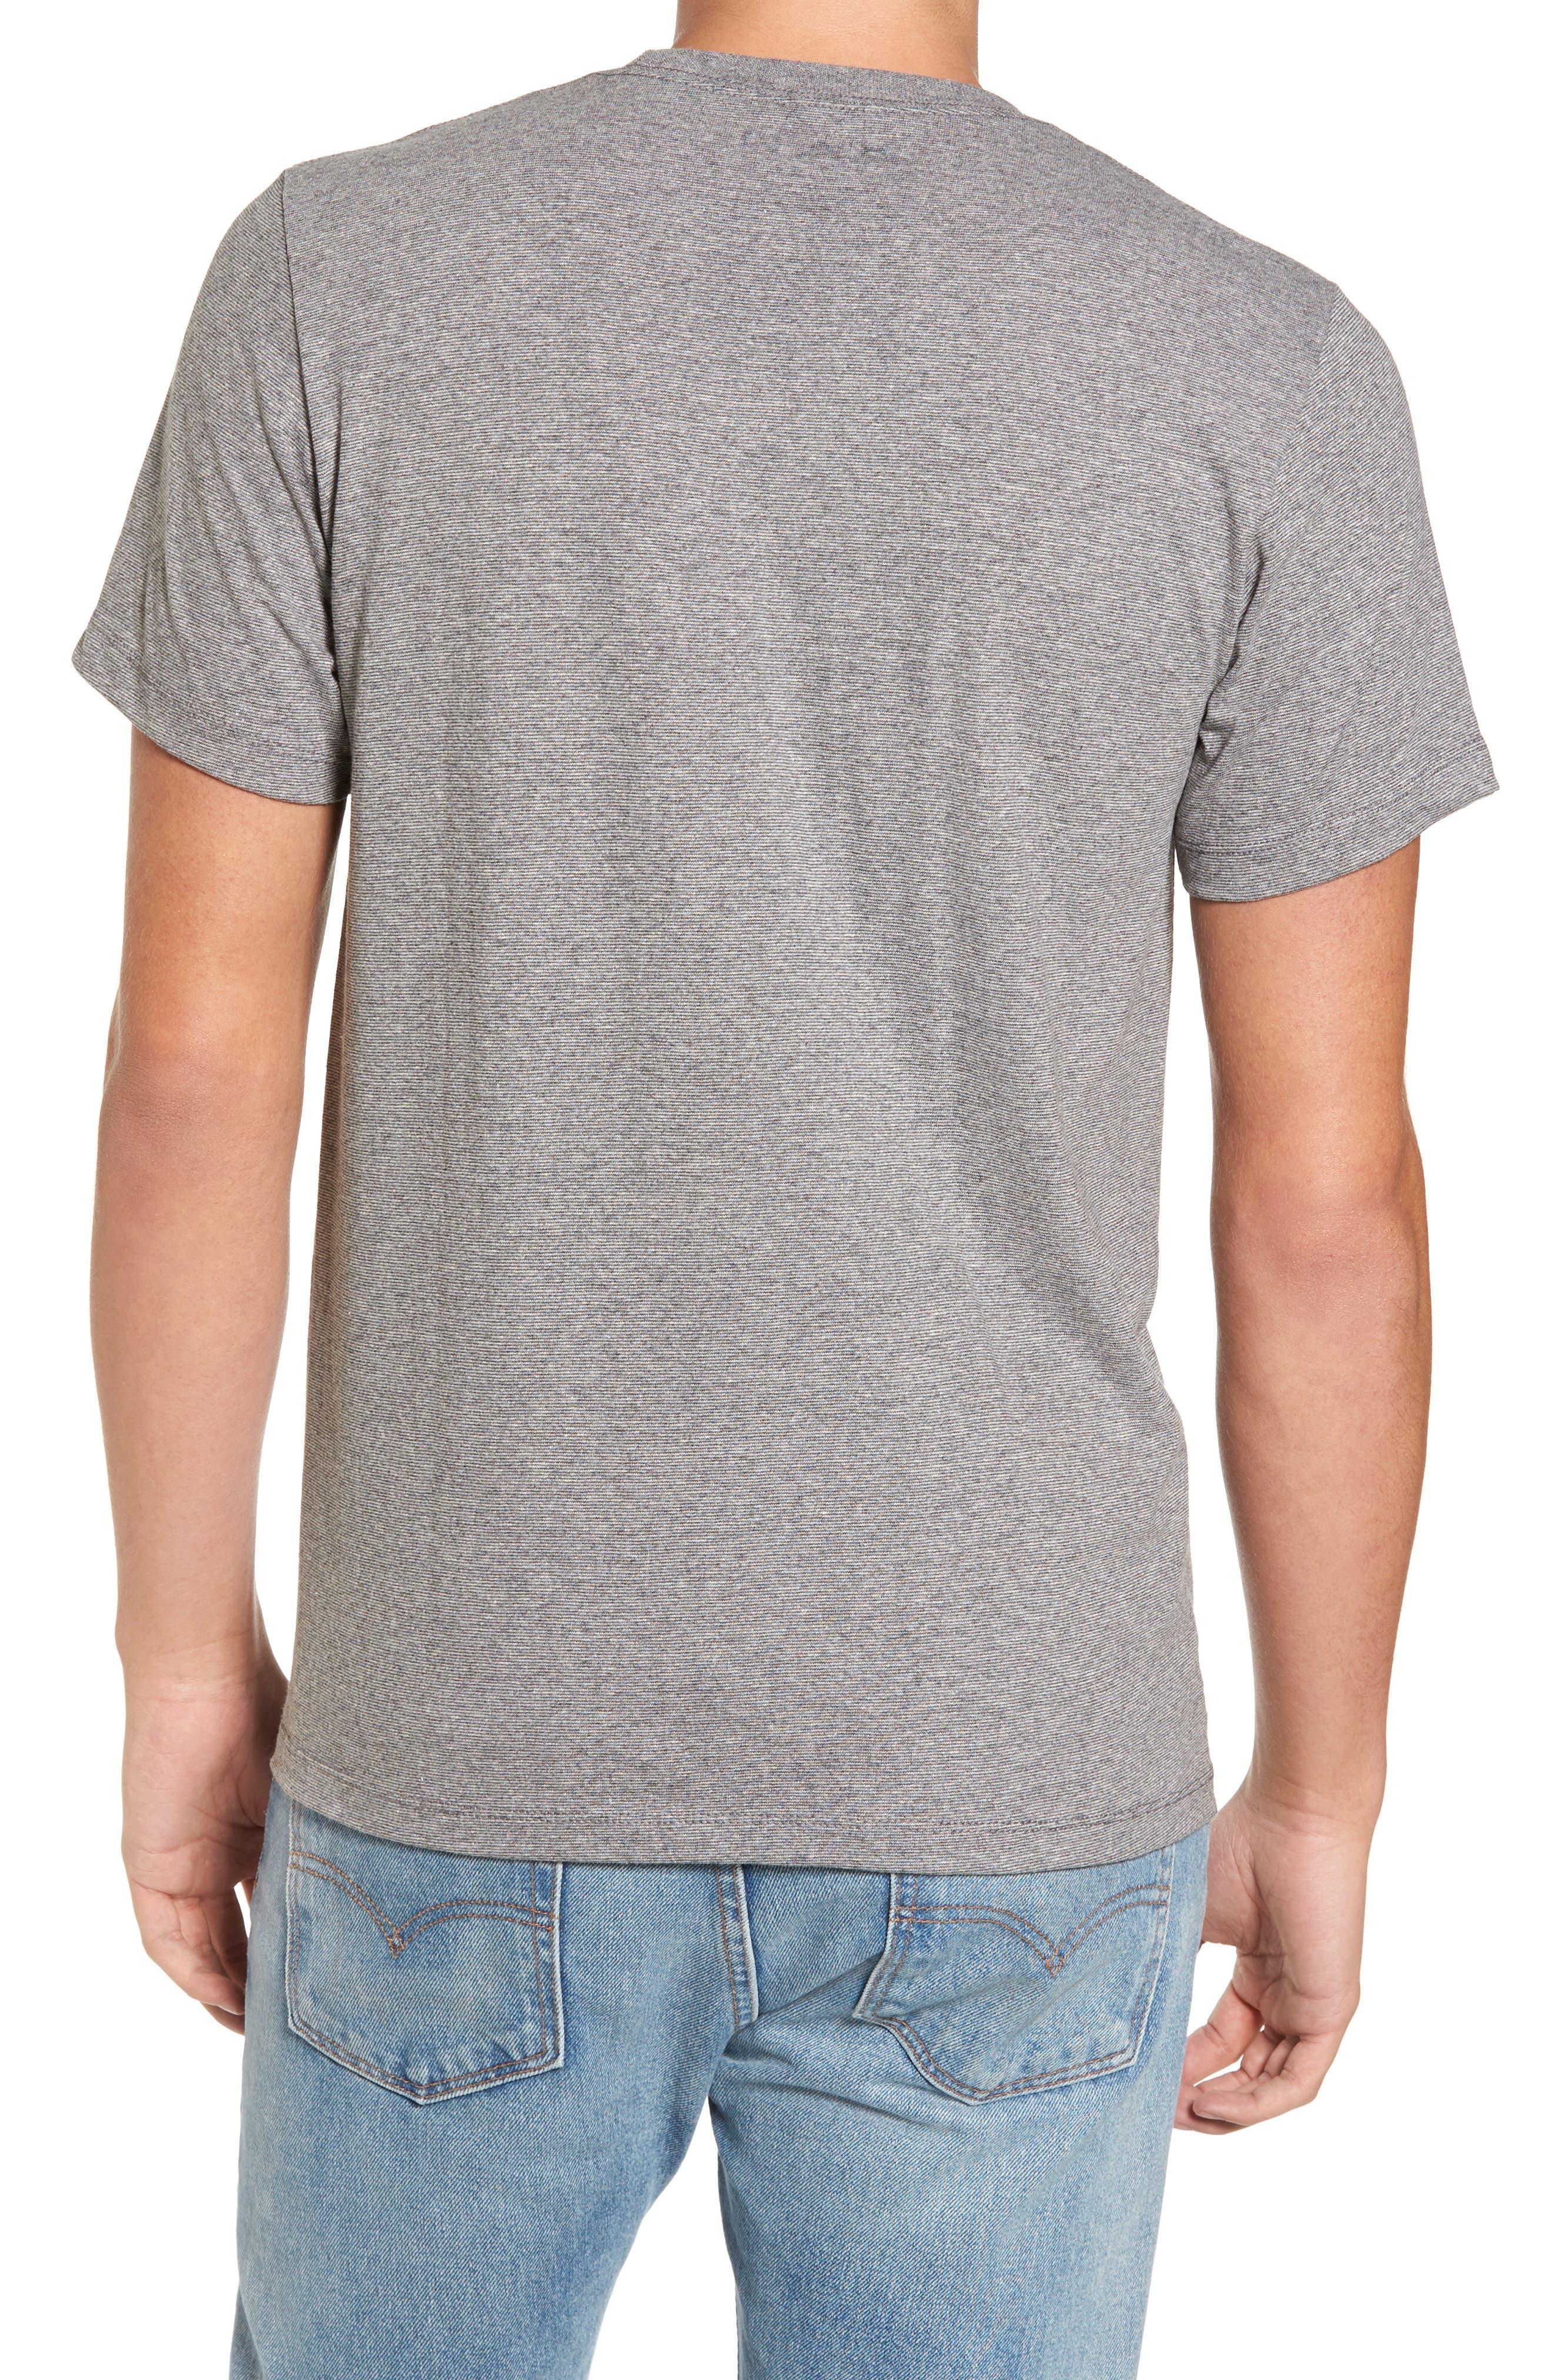 Abe Lincoln T-Shirt,                             Alternate thumbnail 2, color,